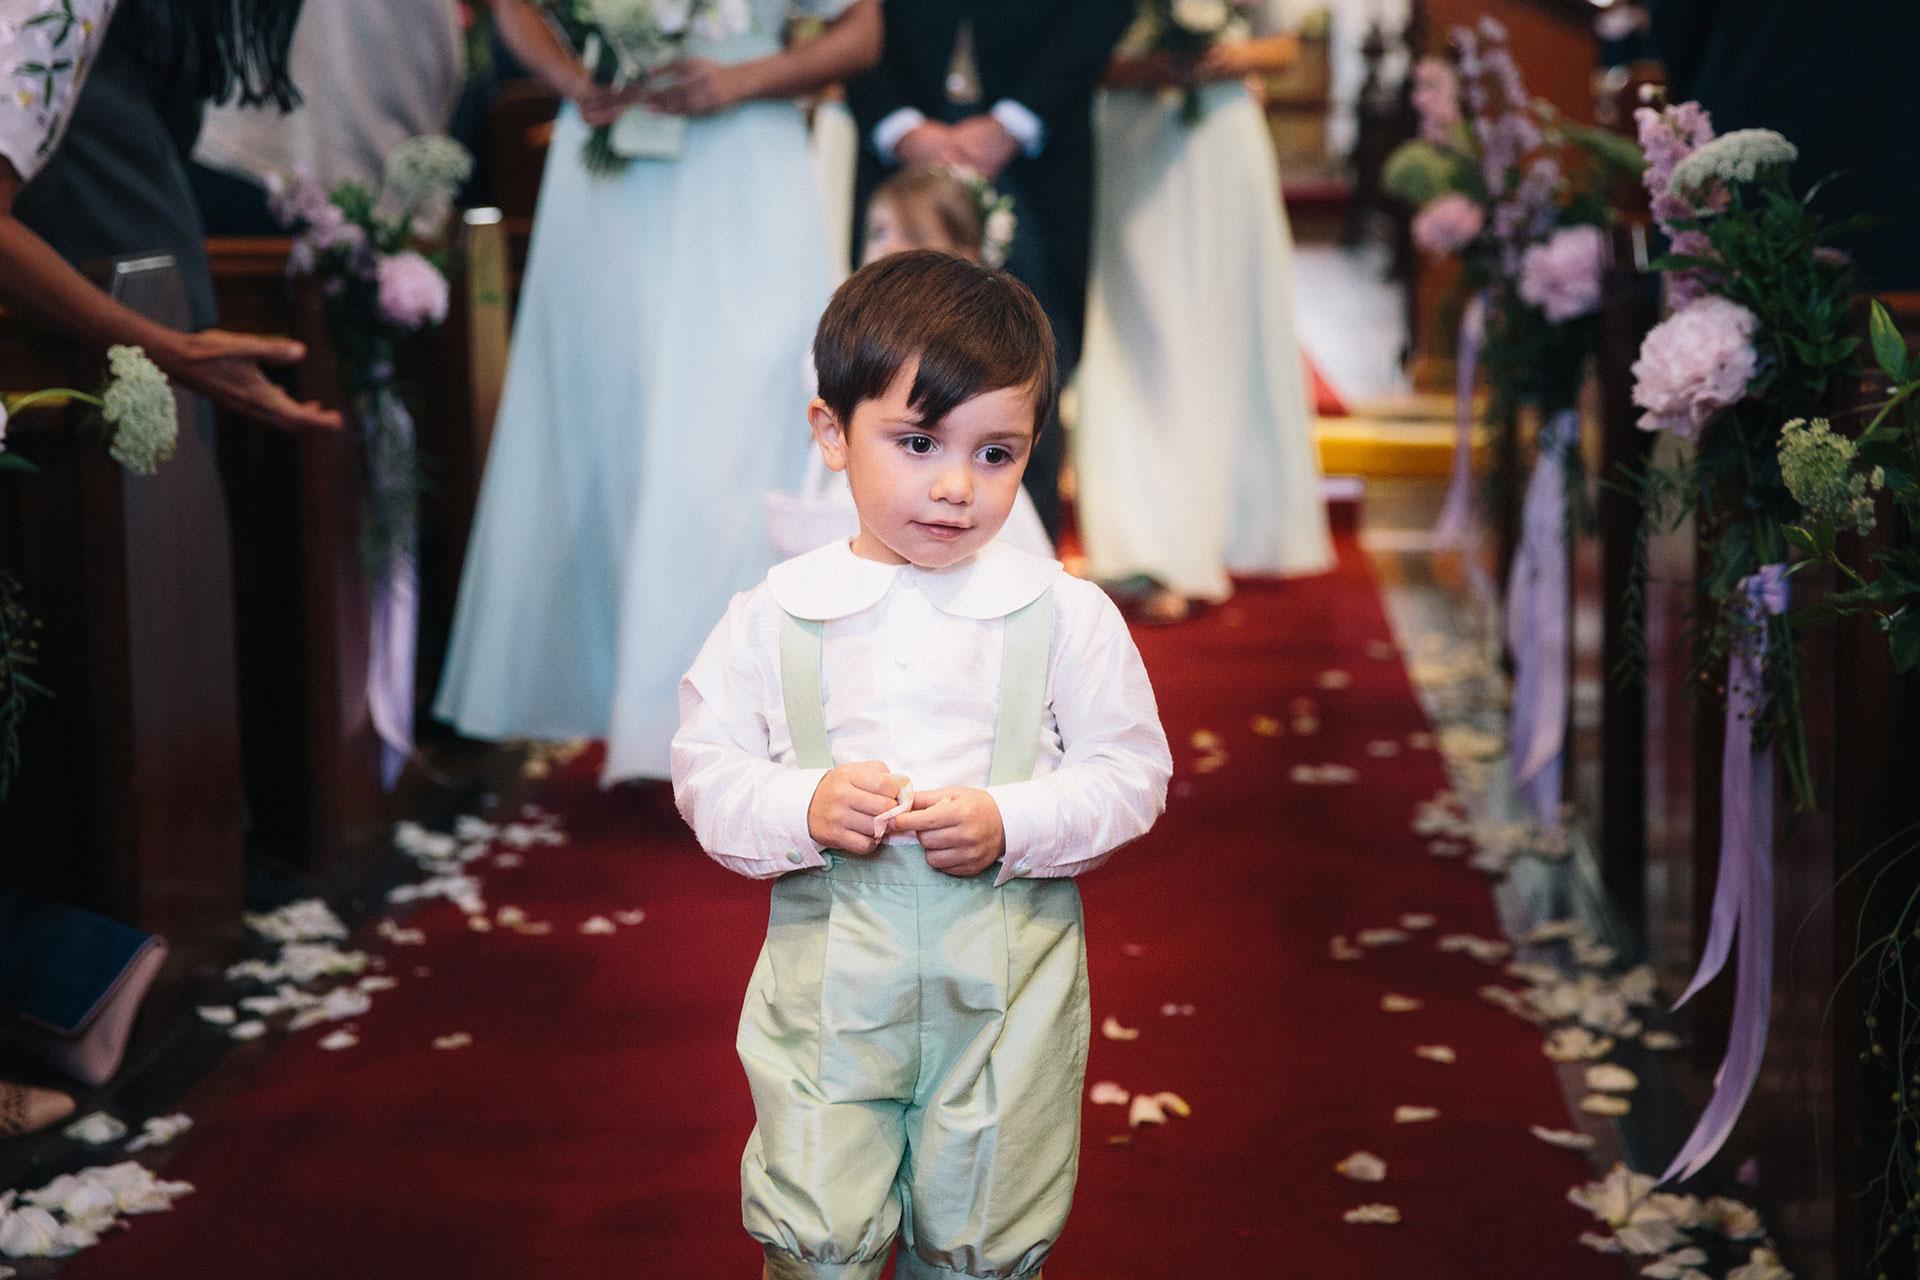 Langar-Hall-wedding-photographer-in-Nottinghamshire-Michael-Newington-Gray-43.jpg